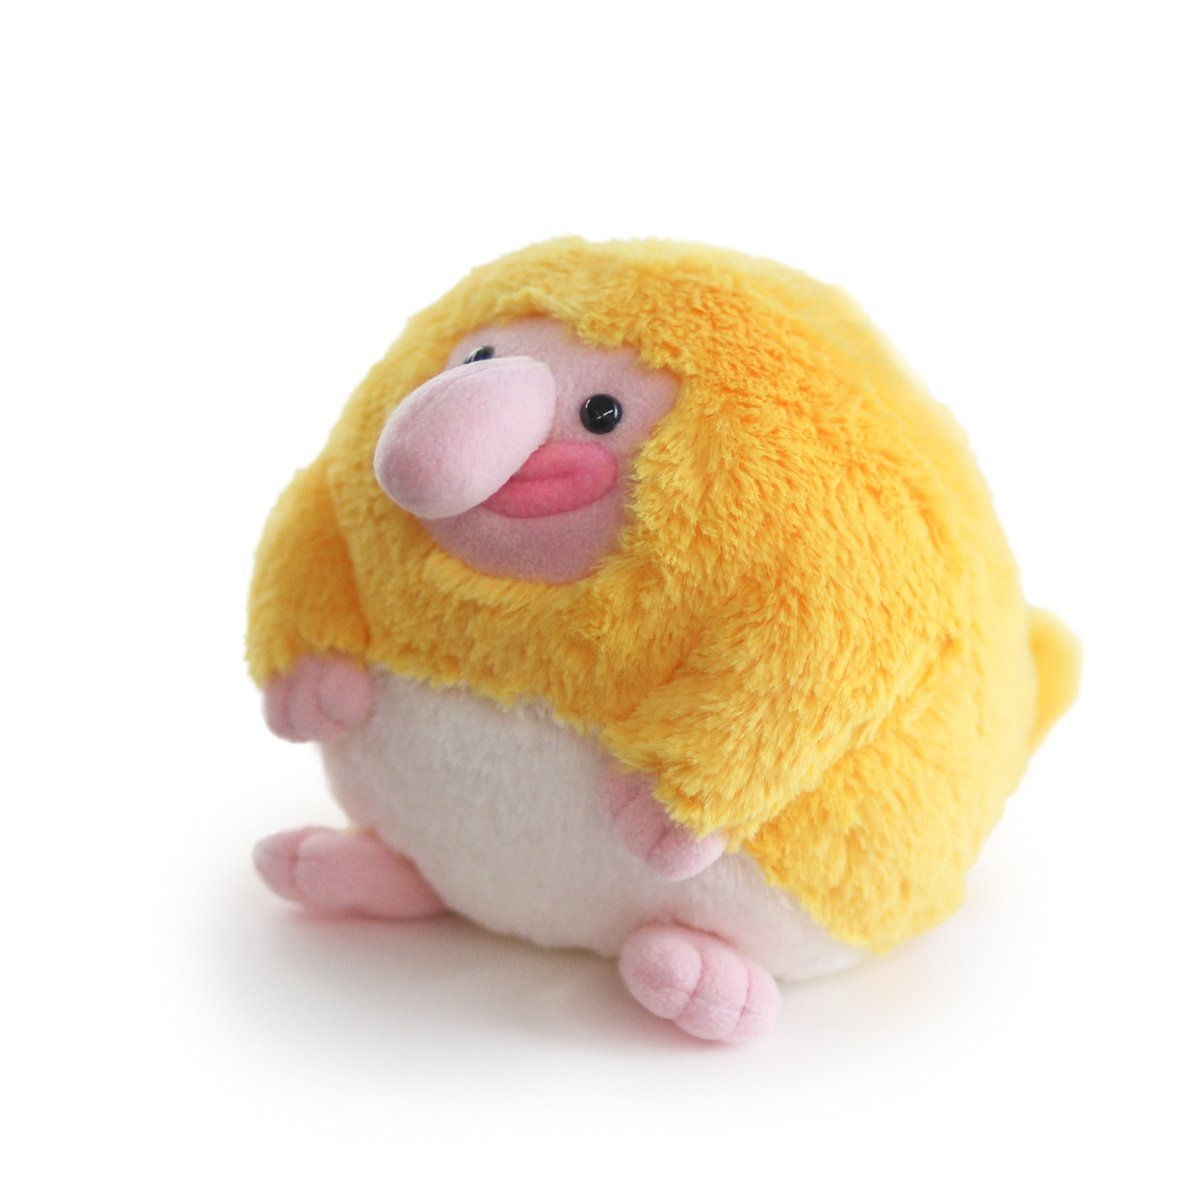 Hashtag Collectibles Stuffed Proboscis Monkey Plush - Mini by Hashtag Collectibles